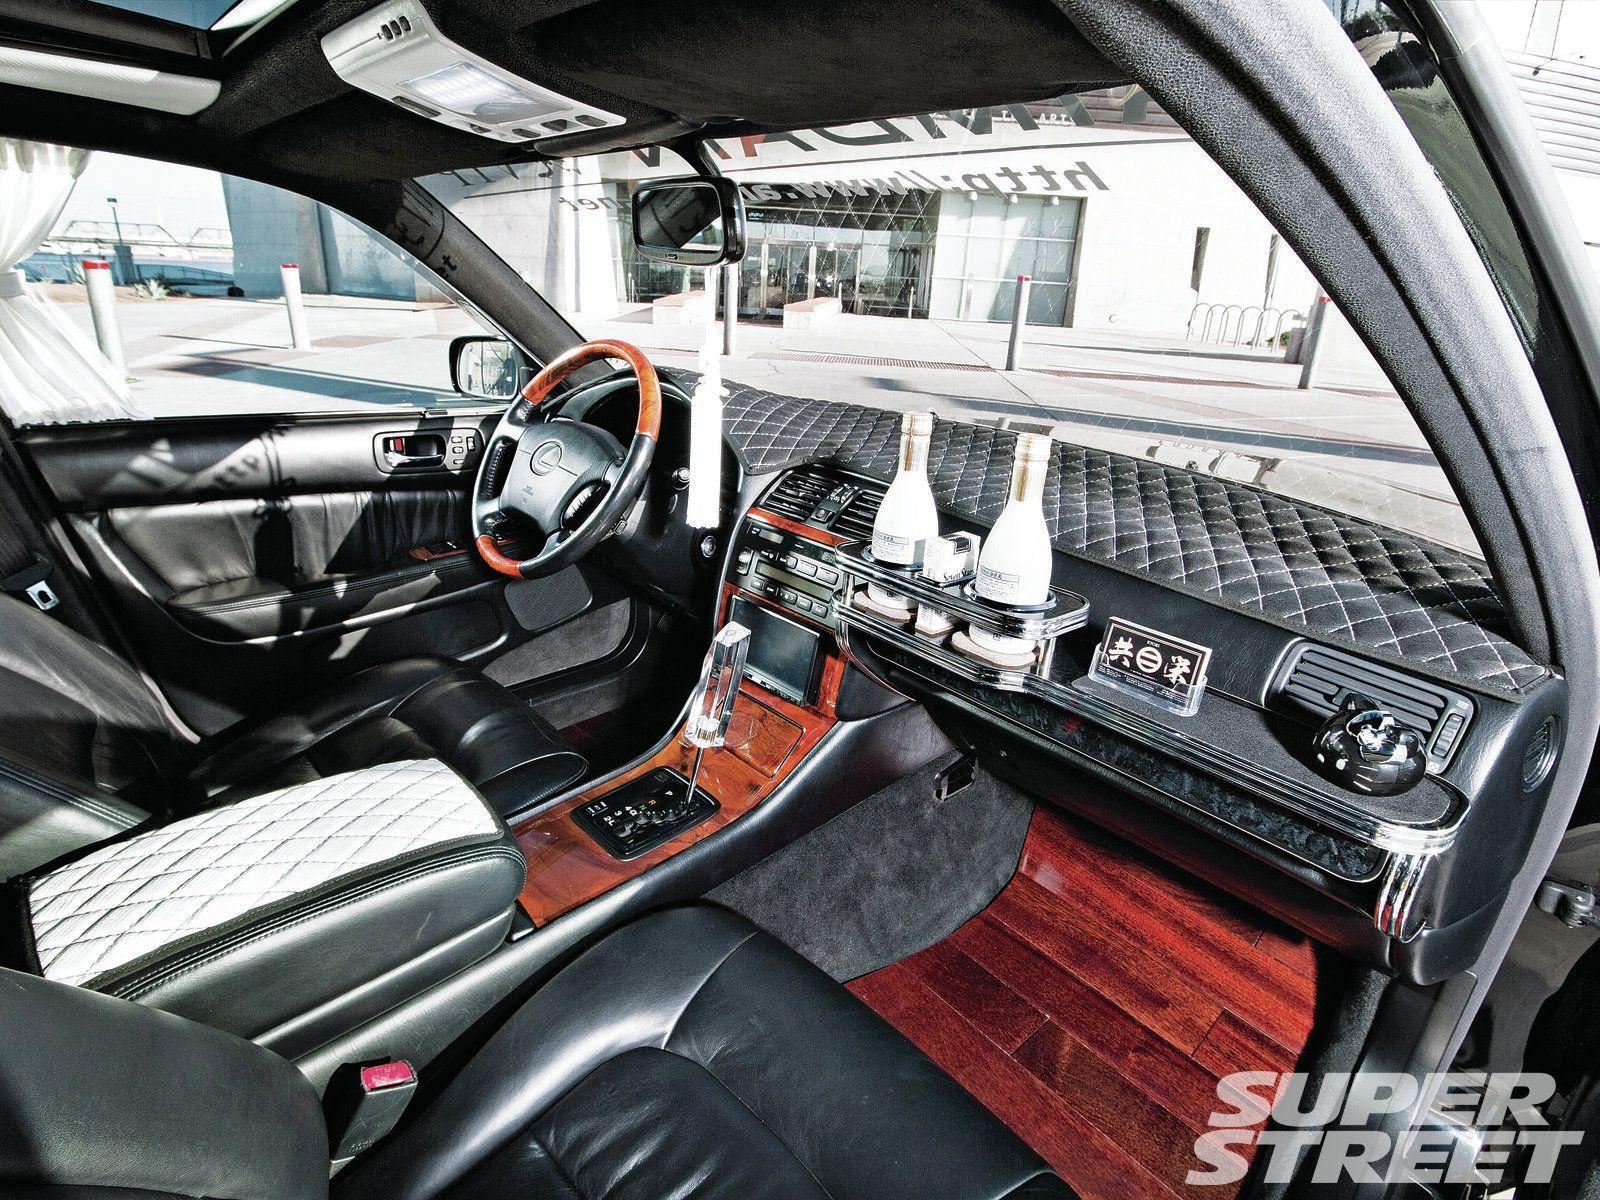 sstp-1206-06+1999-lexus-ls400+interior